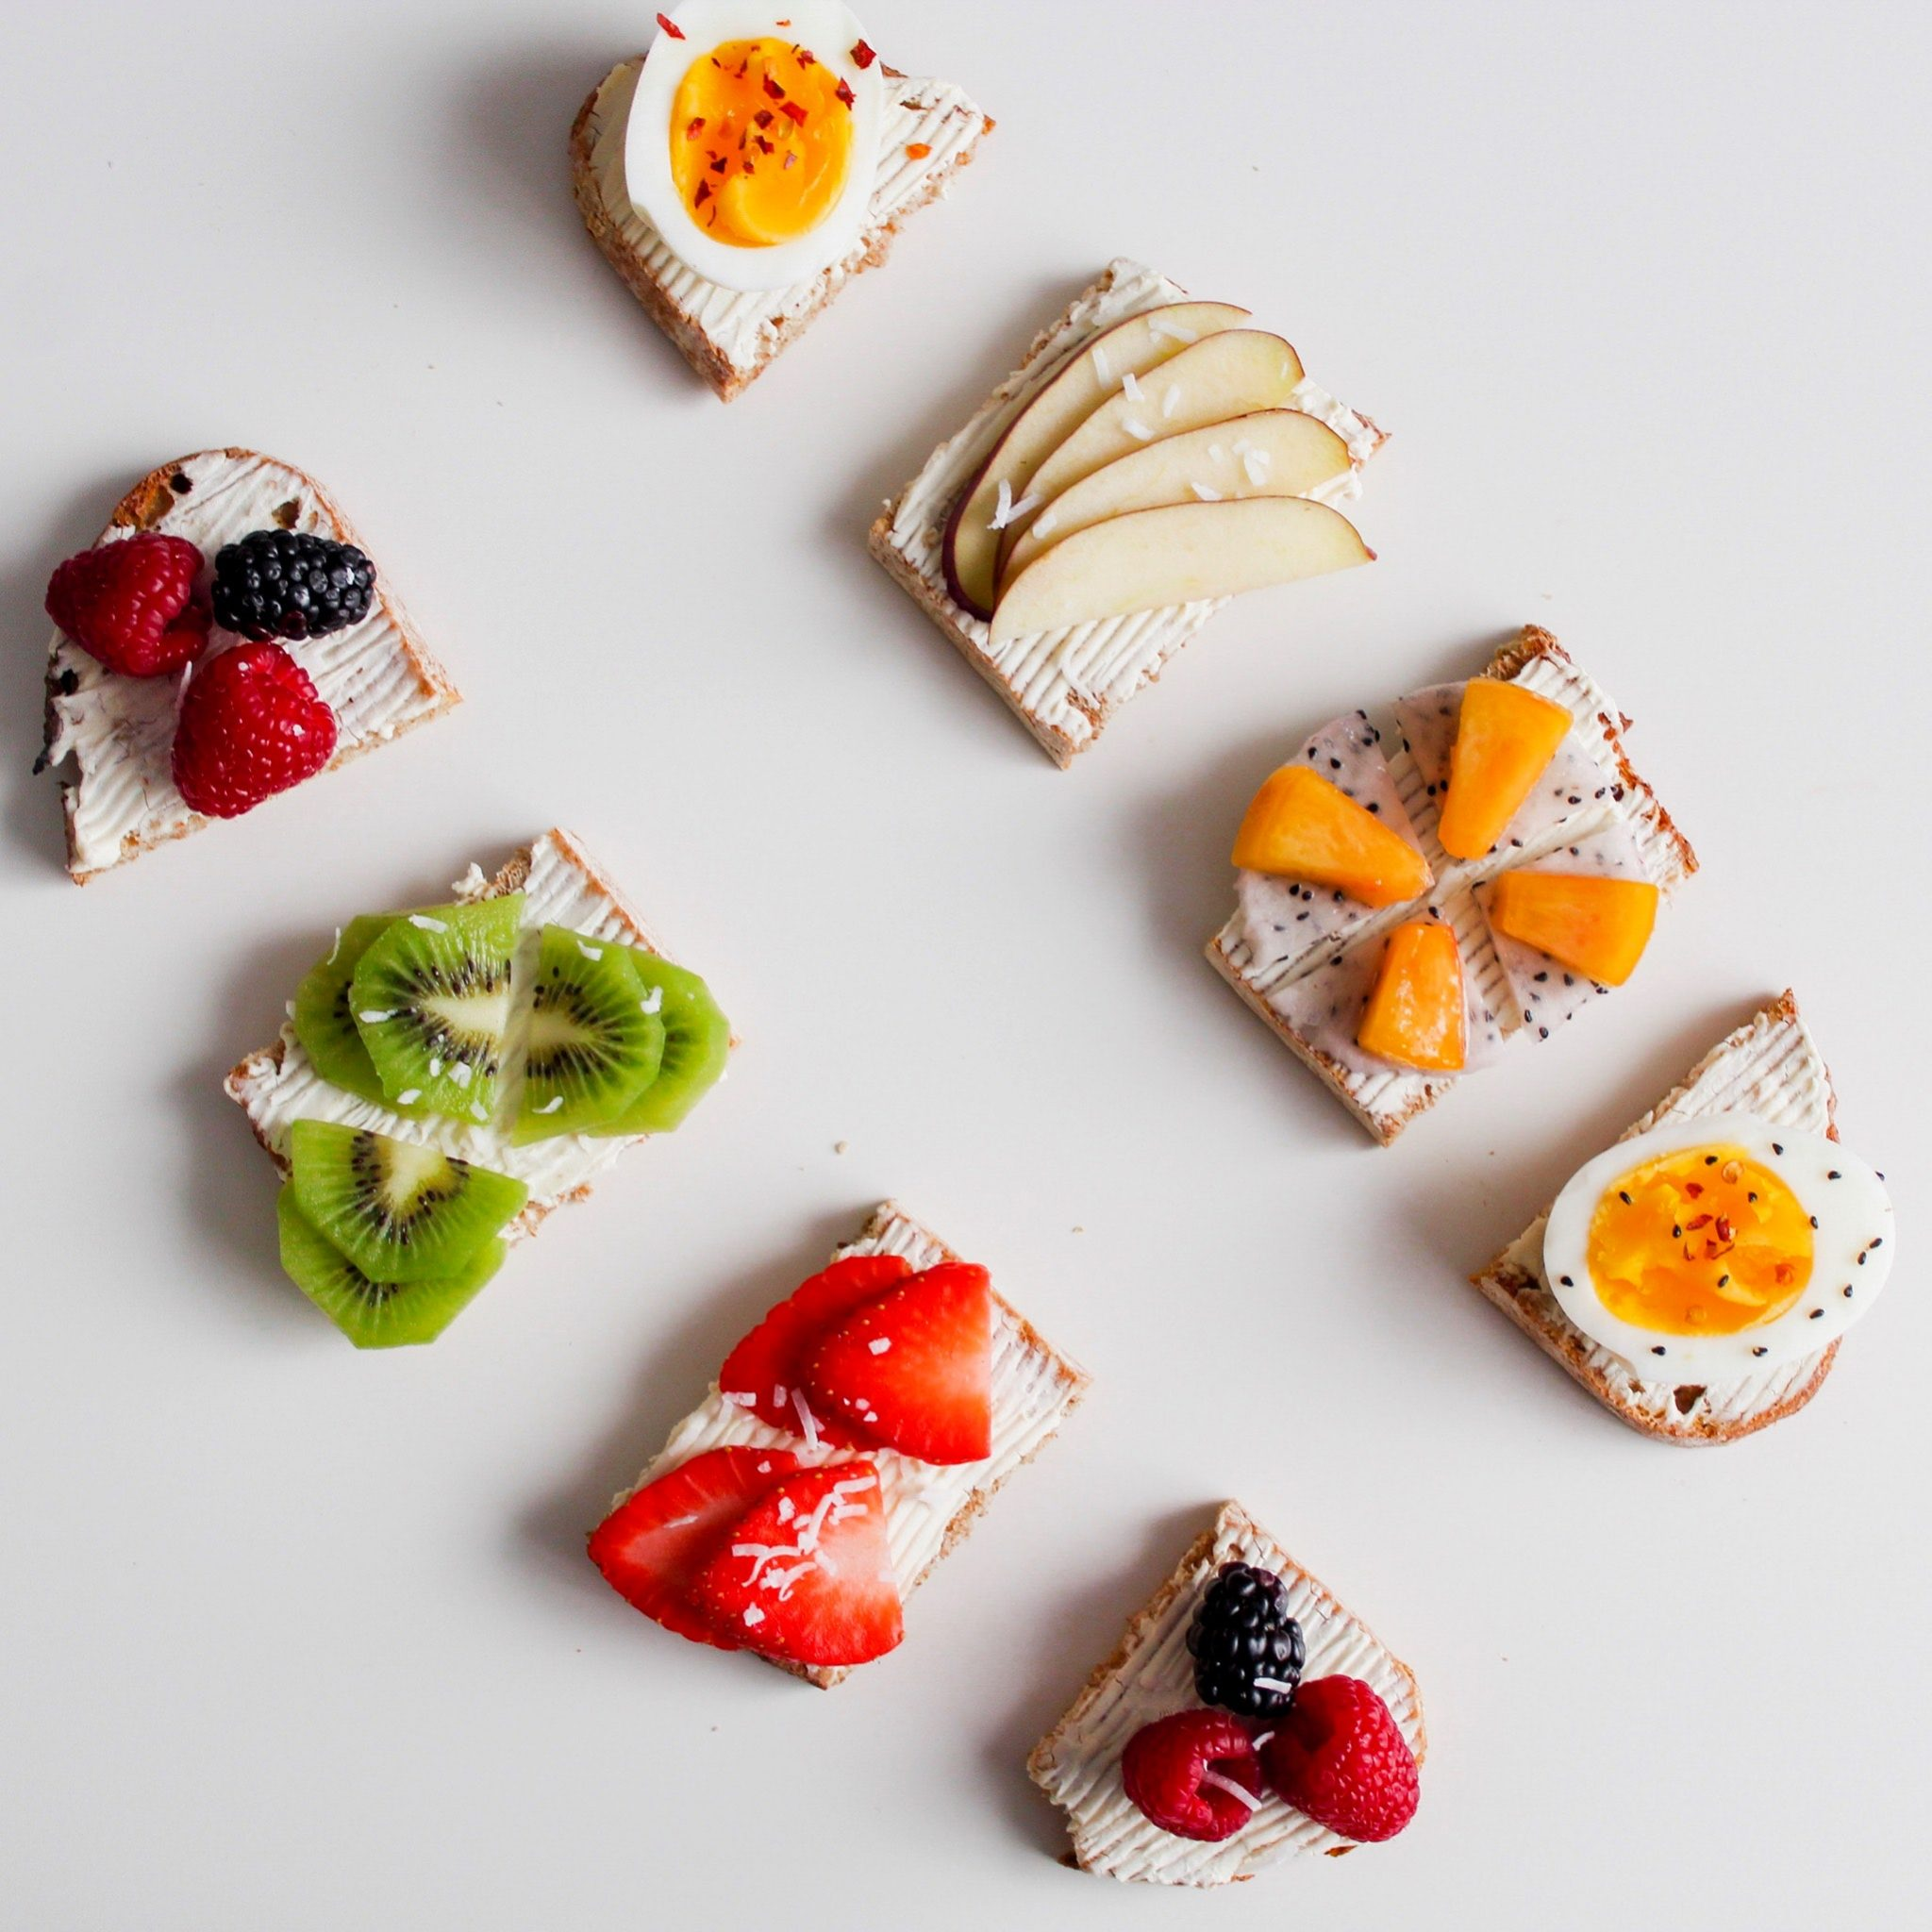 Berries breakfast brunch on melba toast with cream cheese